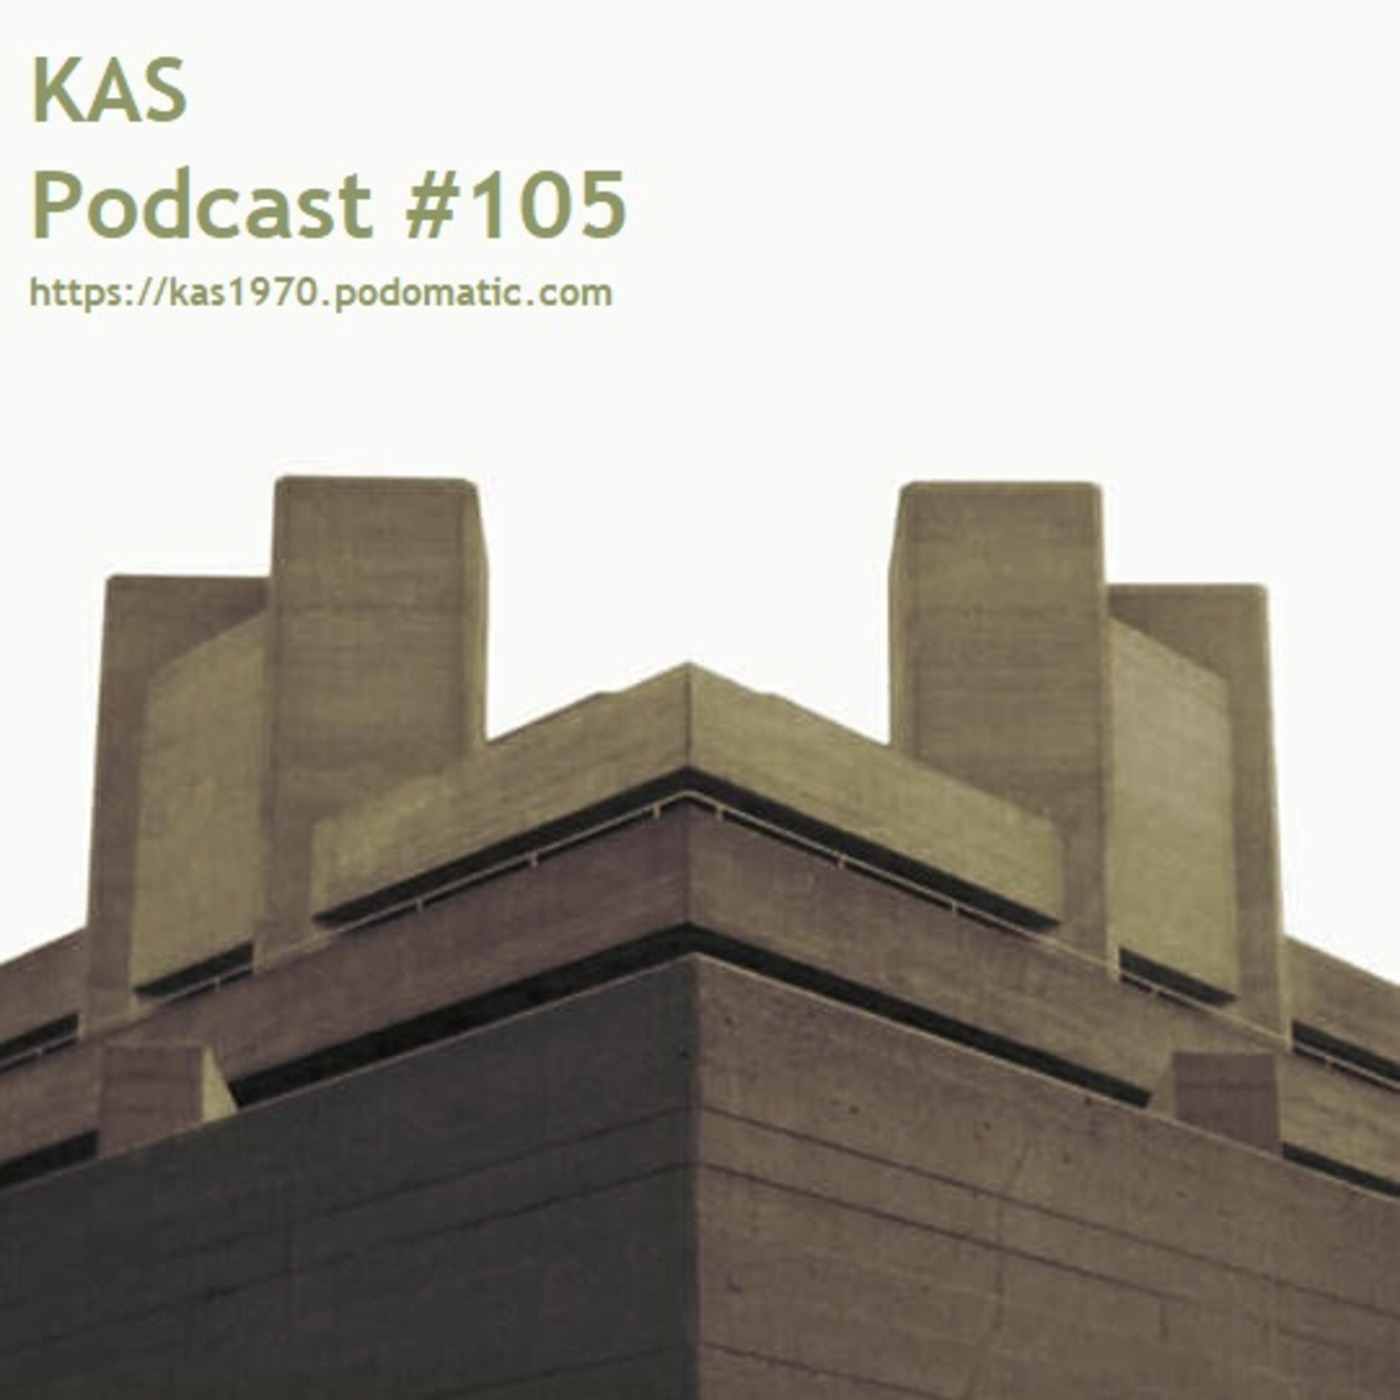 KAS - Podcast #105 Kader's Soulful/Deep/Afro House Podcast (Live